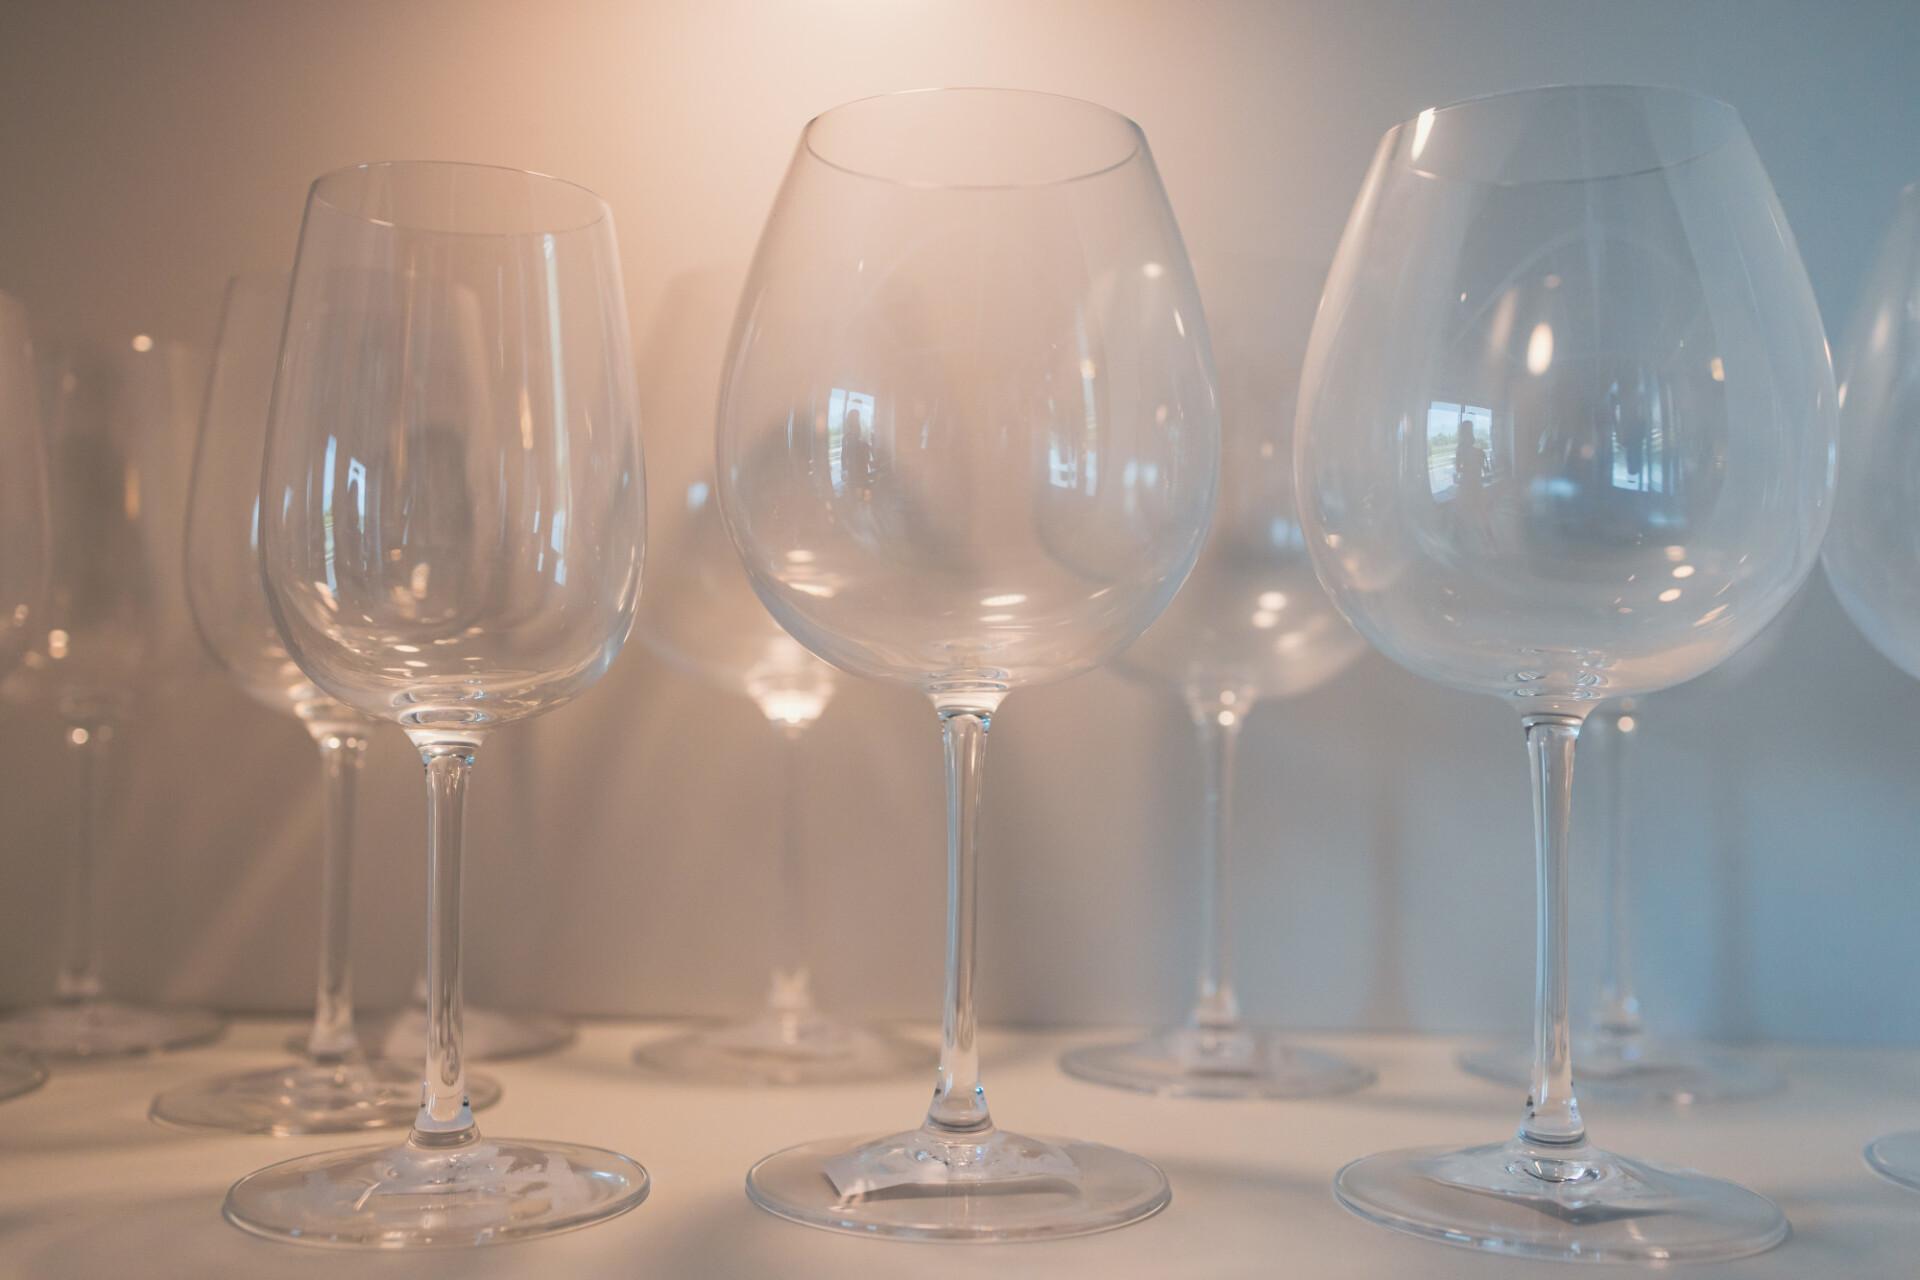 Dusty wine glasses in a showcase